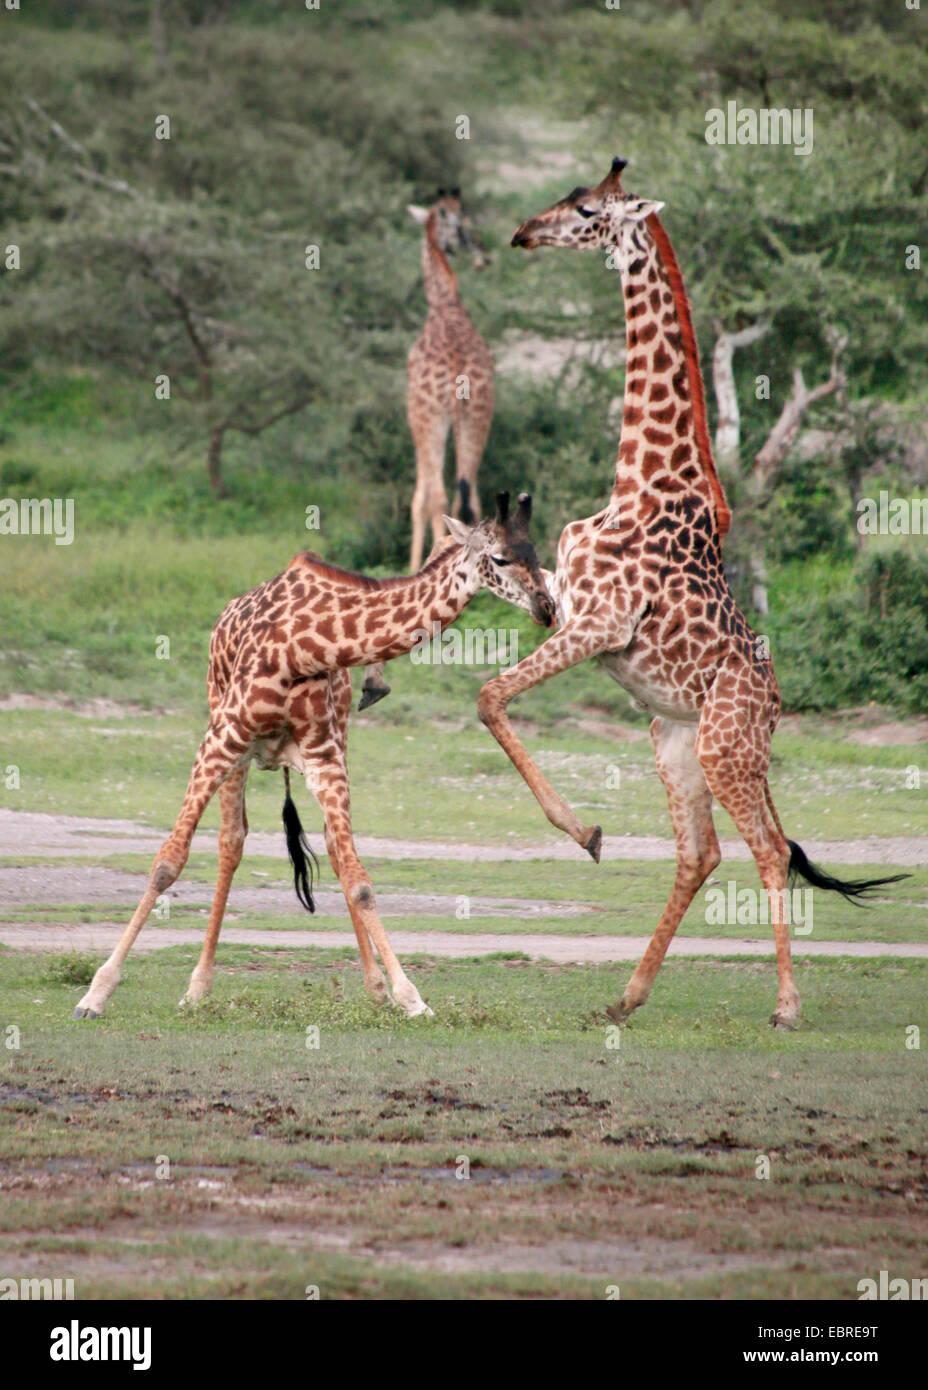 Masai jirafa (Giraffa camelopardalis tippelskirchi), los combates jirafas, Tanzania, el Parque nacional Serengeti Imagen De Stock